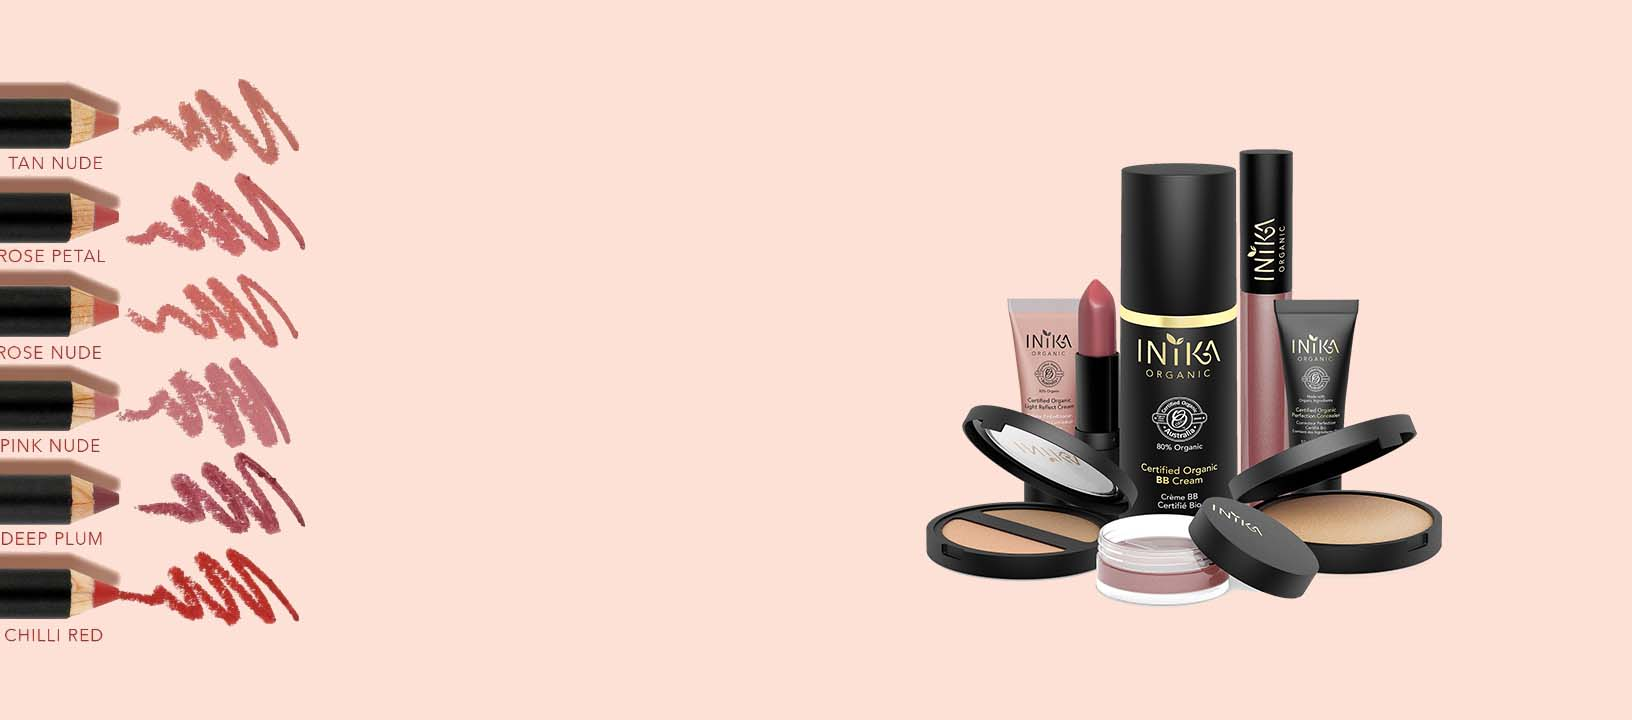 INIKA-Lipstick-slider-product